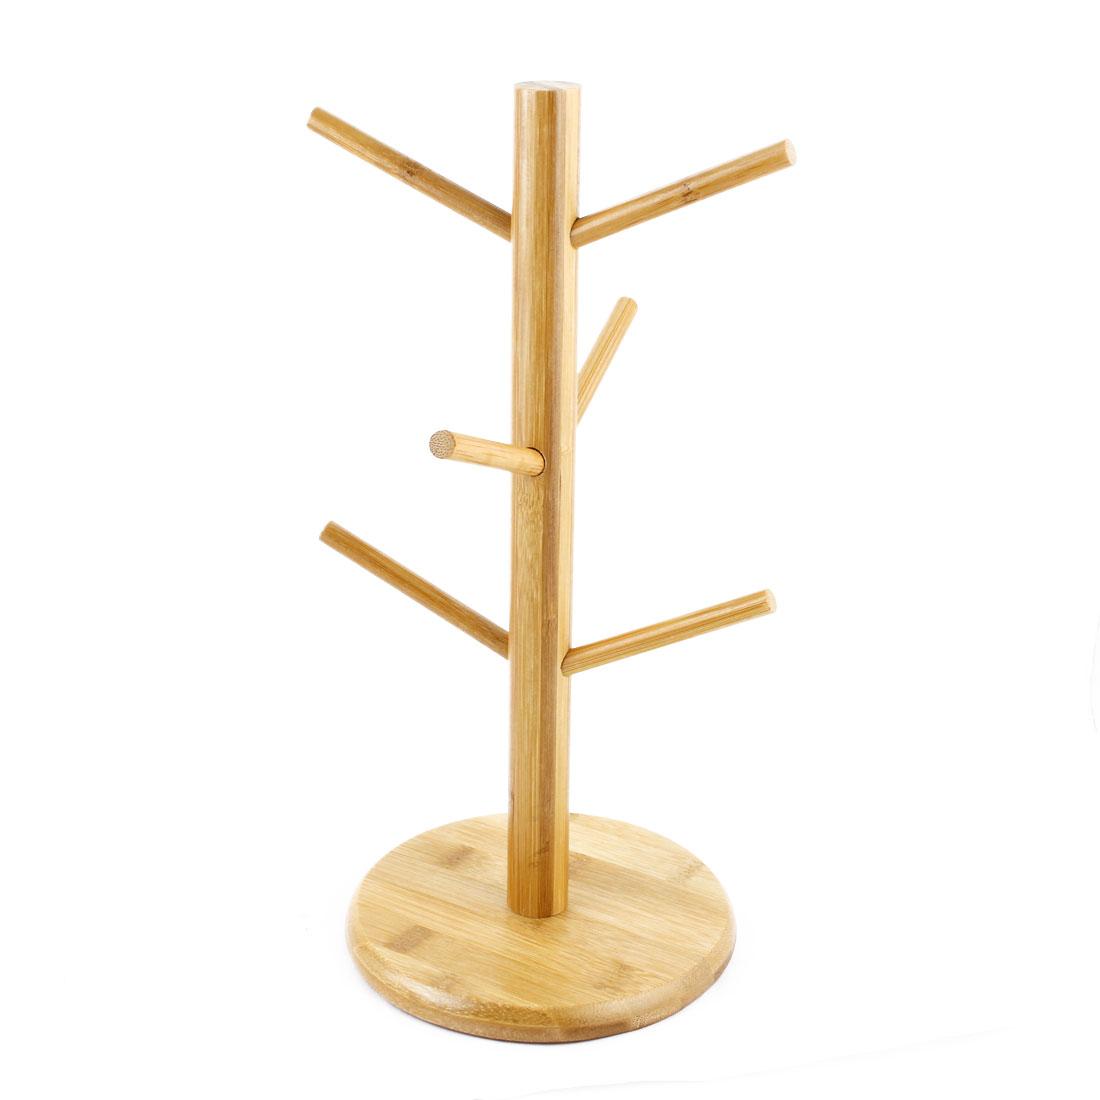 Household Bamboo Hanging Display Coffee Tea Glass Cup Holder Bracket Mug Tree